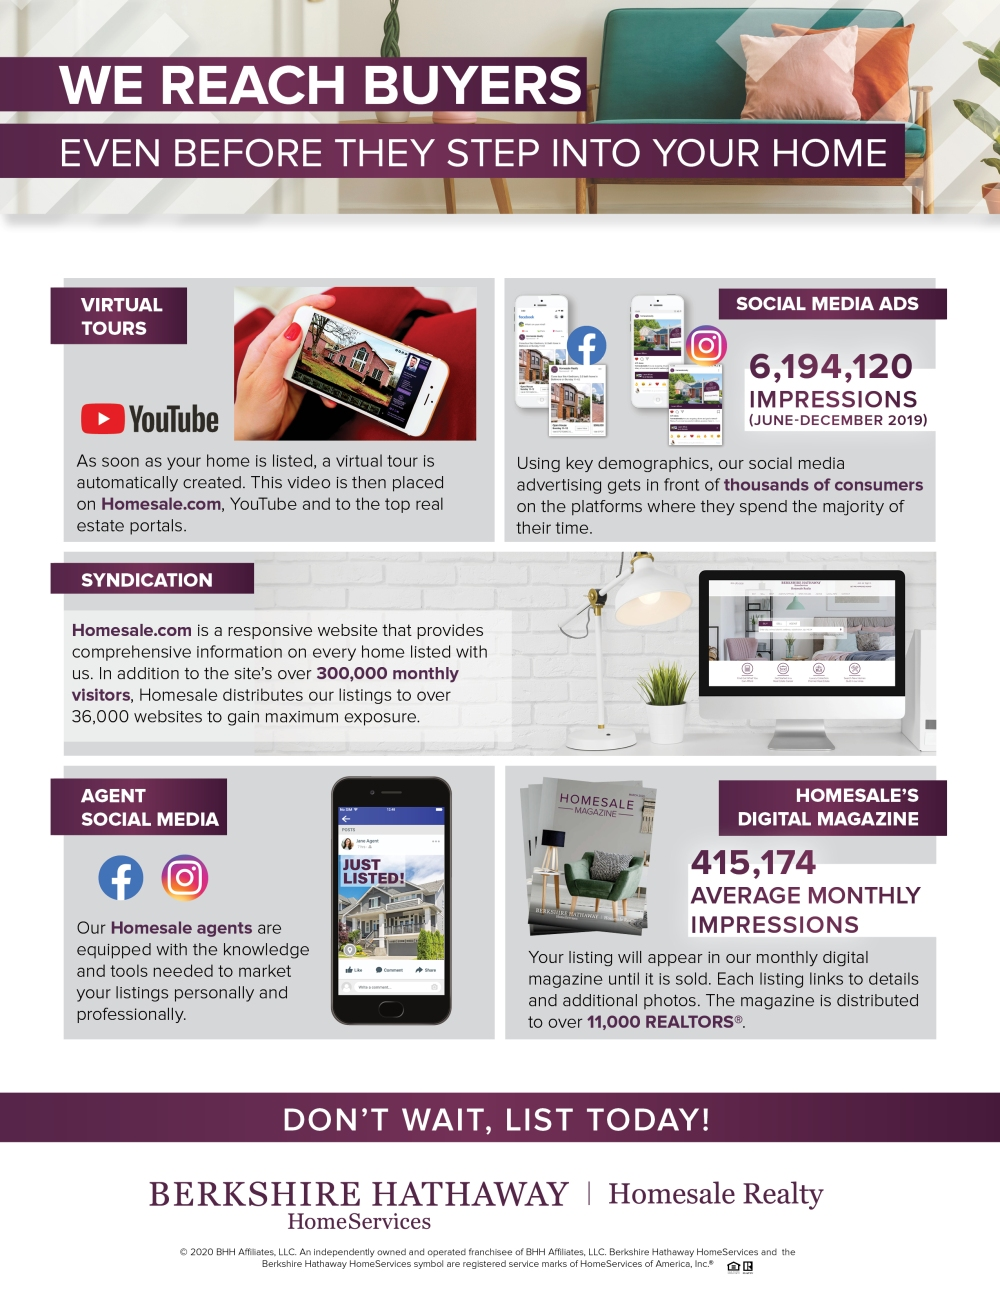 Homesale Marketing